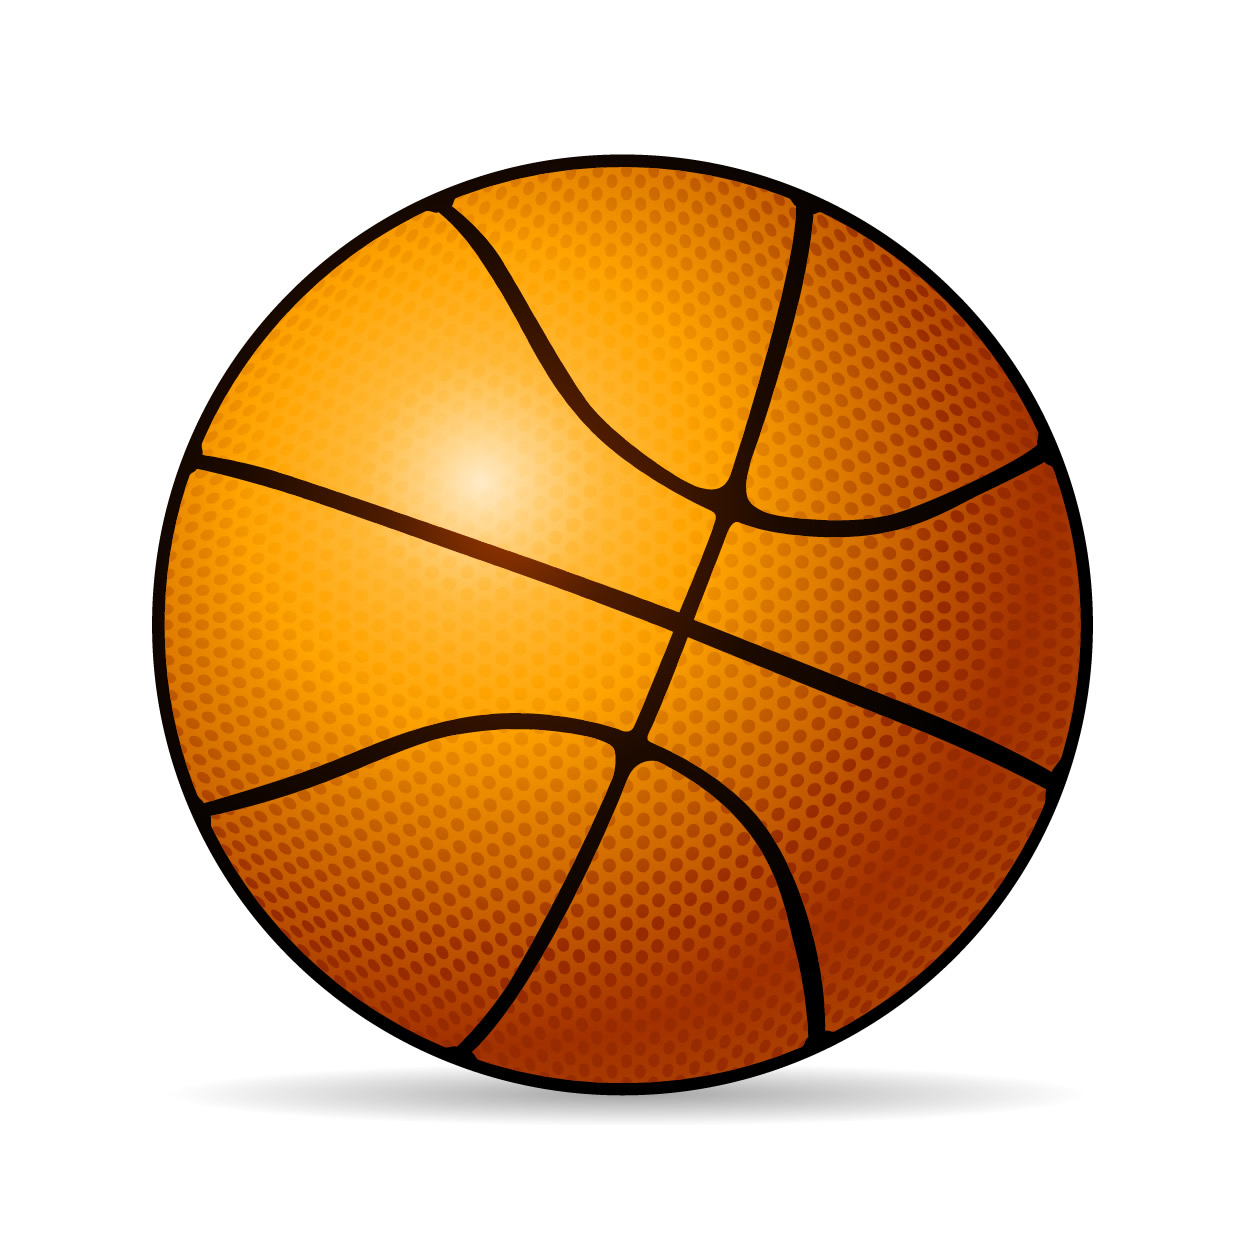 1250x1250 Ball Clipart Cartoon Basketball